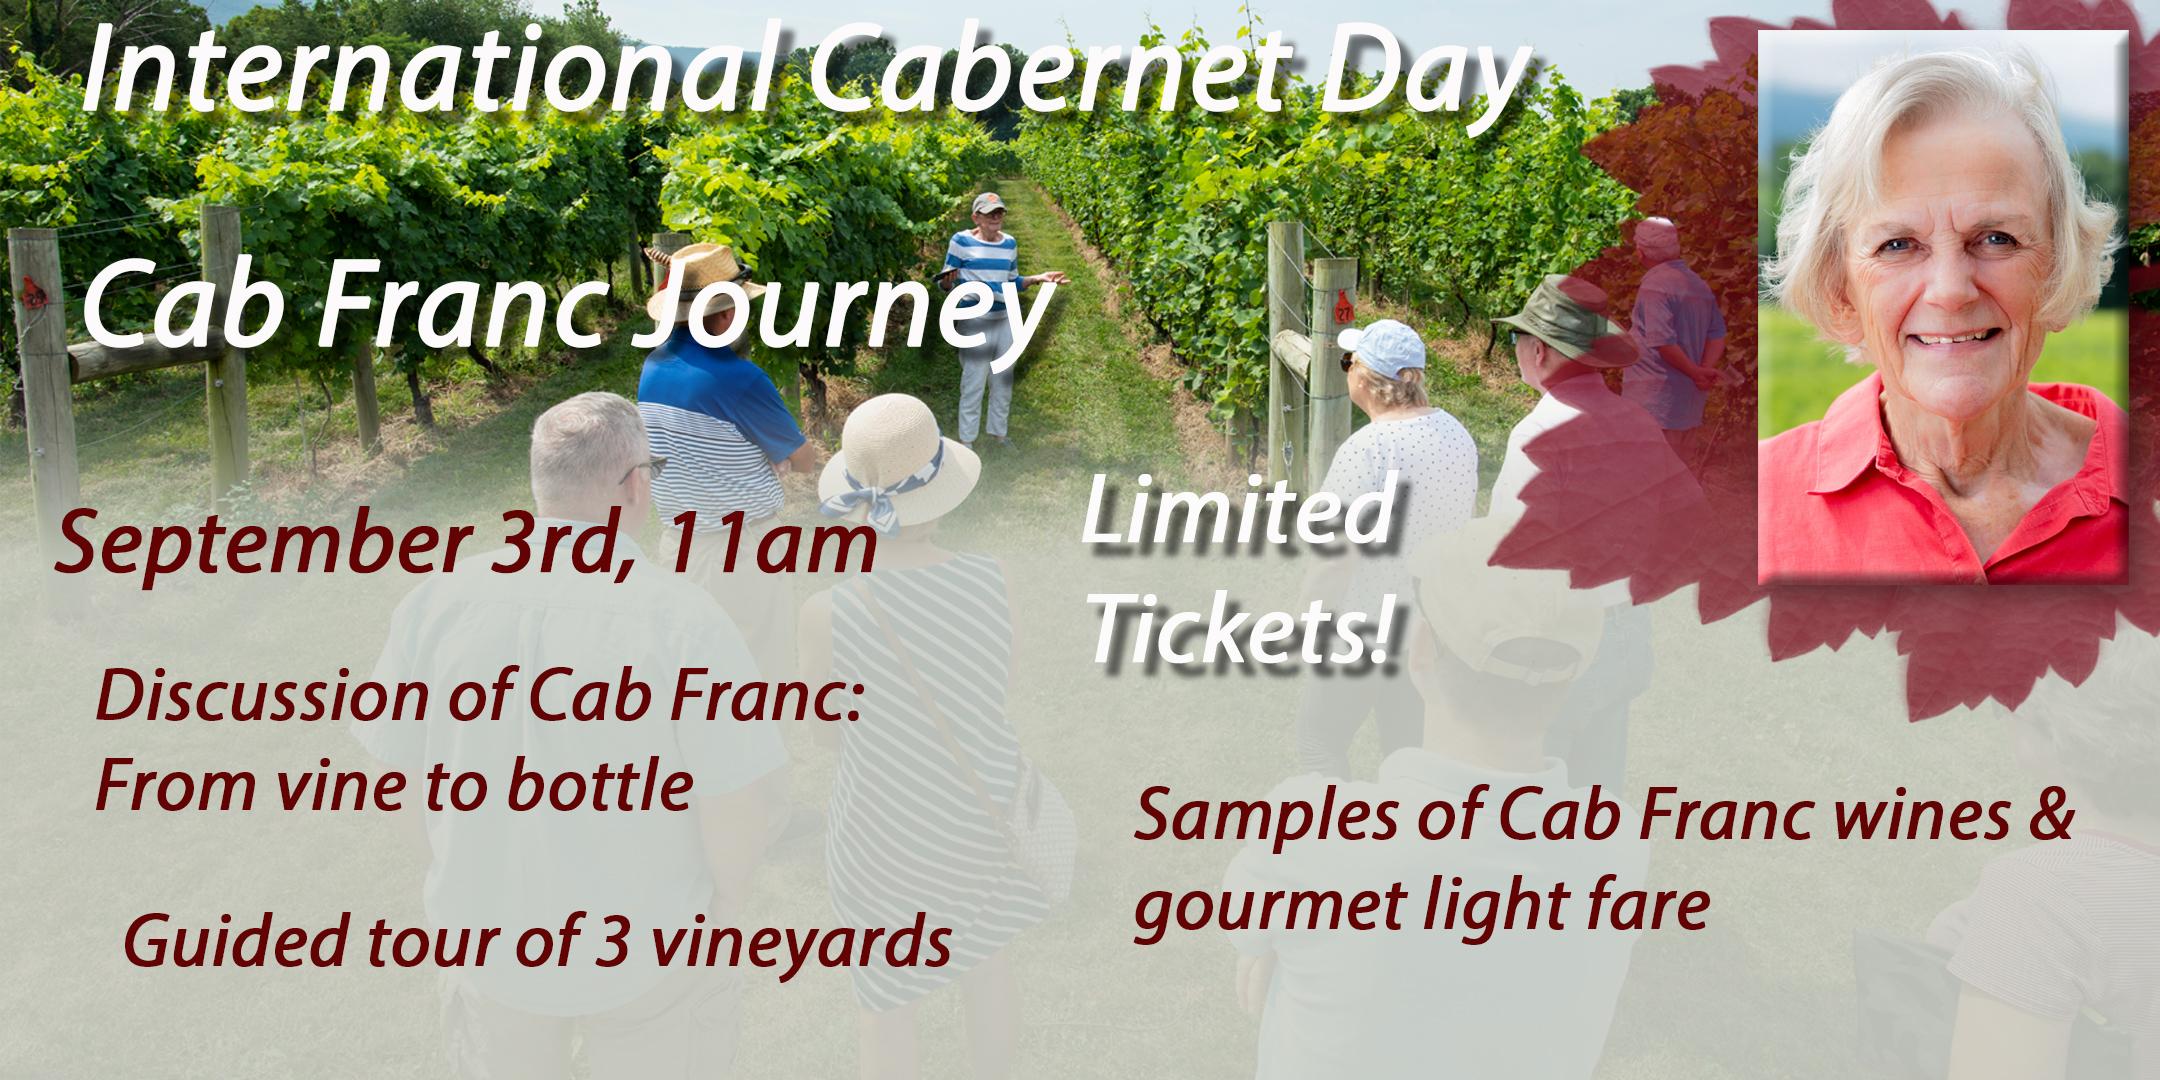 Cab Franc Journey